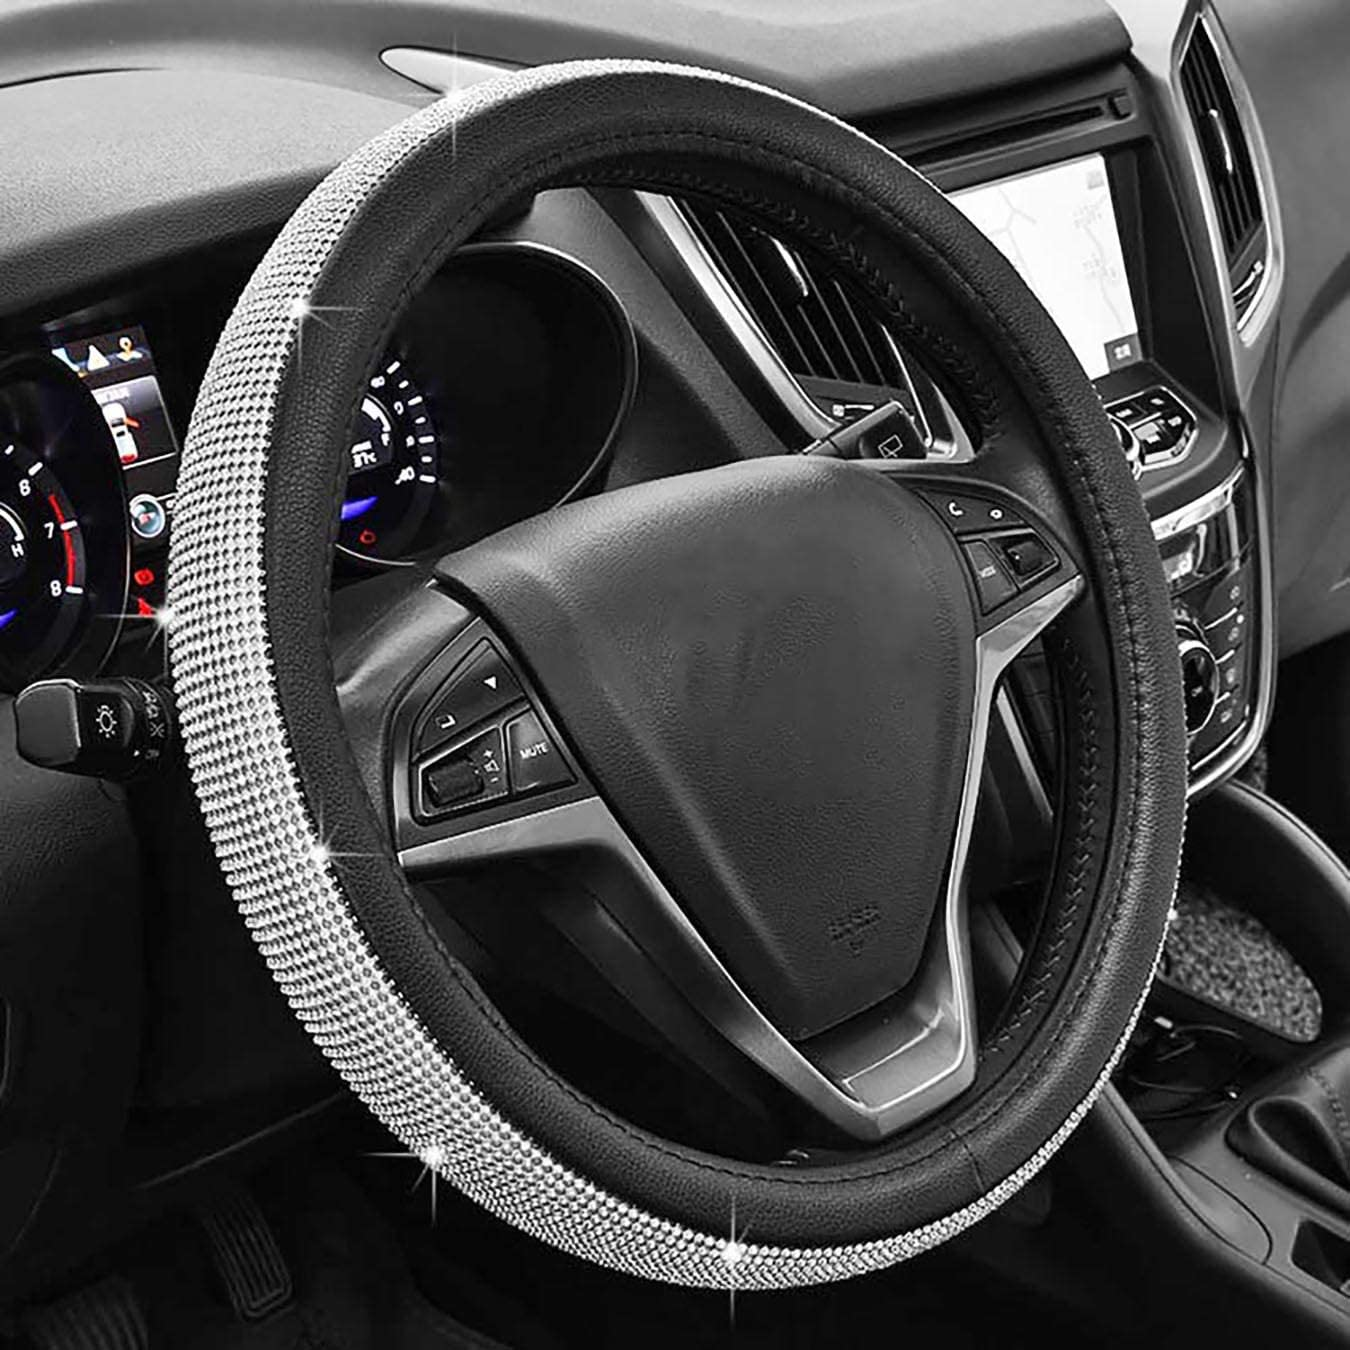 Universal Sparkly Diamant Auto Lenkradabdeckung 38cm 15 Voll Bling Bling Strass Leder Lenkradabdeckung Autoinnenraum Auto Styling Dekor Zubehör Black Auto